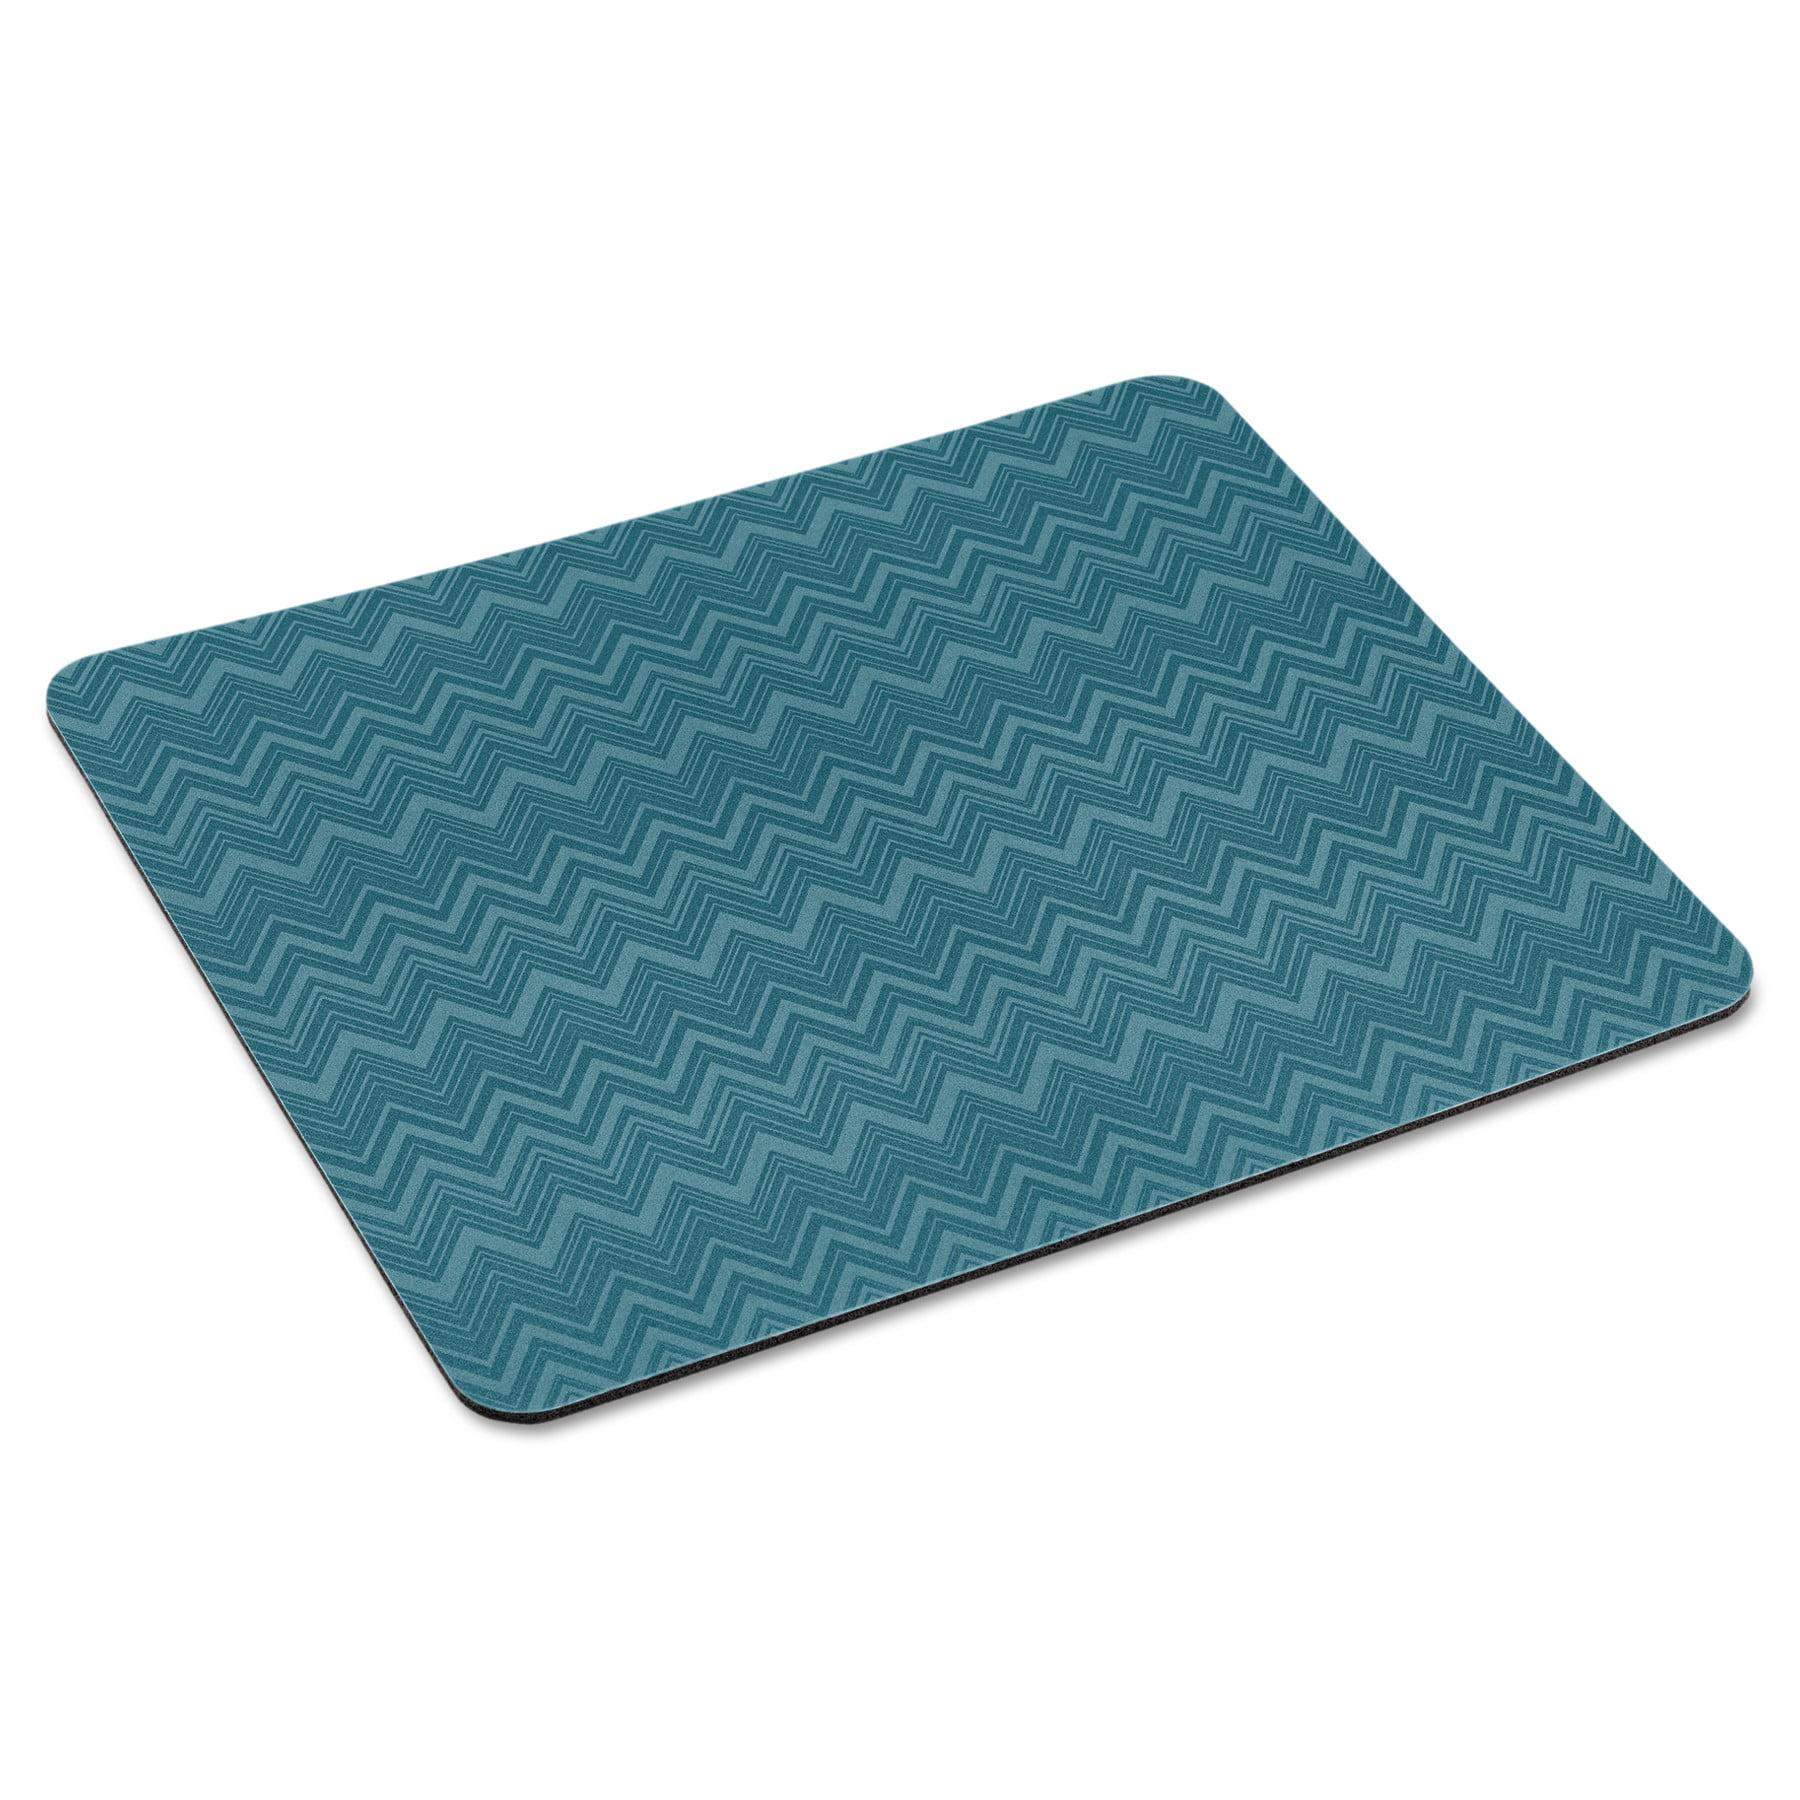 "3M Mouse Pad with Precise Mousing Surface, 9"" x 8"" x 1/5"", Chevron Design"